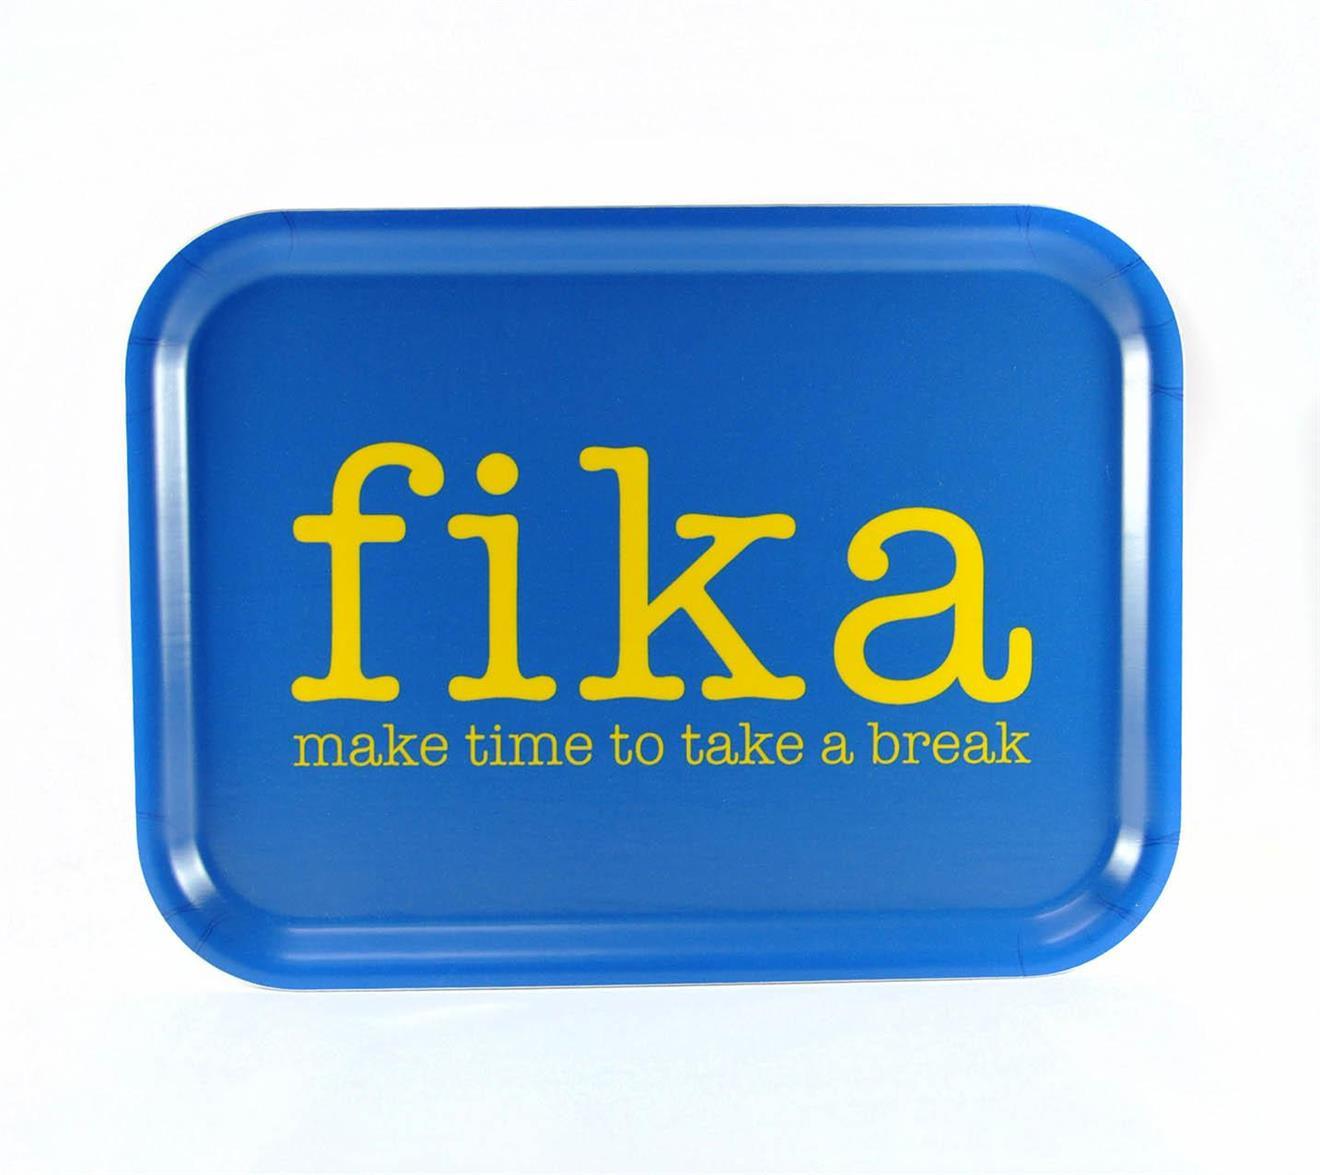 Bricka 27x20 cm, Make time FIKA, blå/gul text